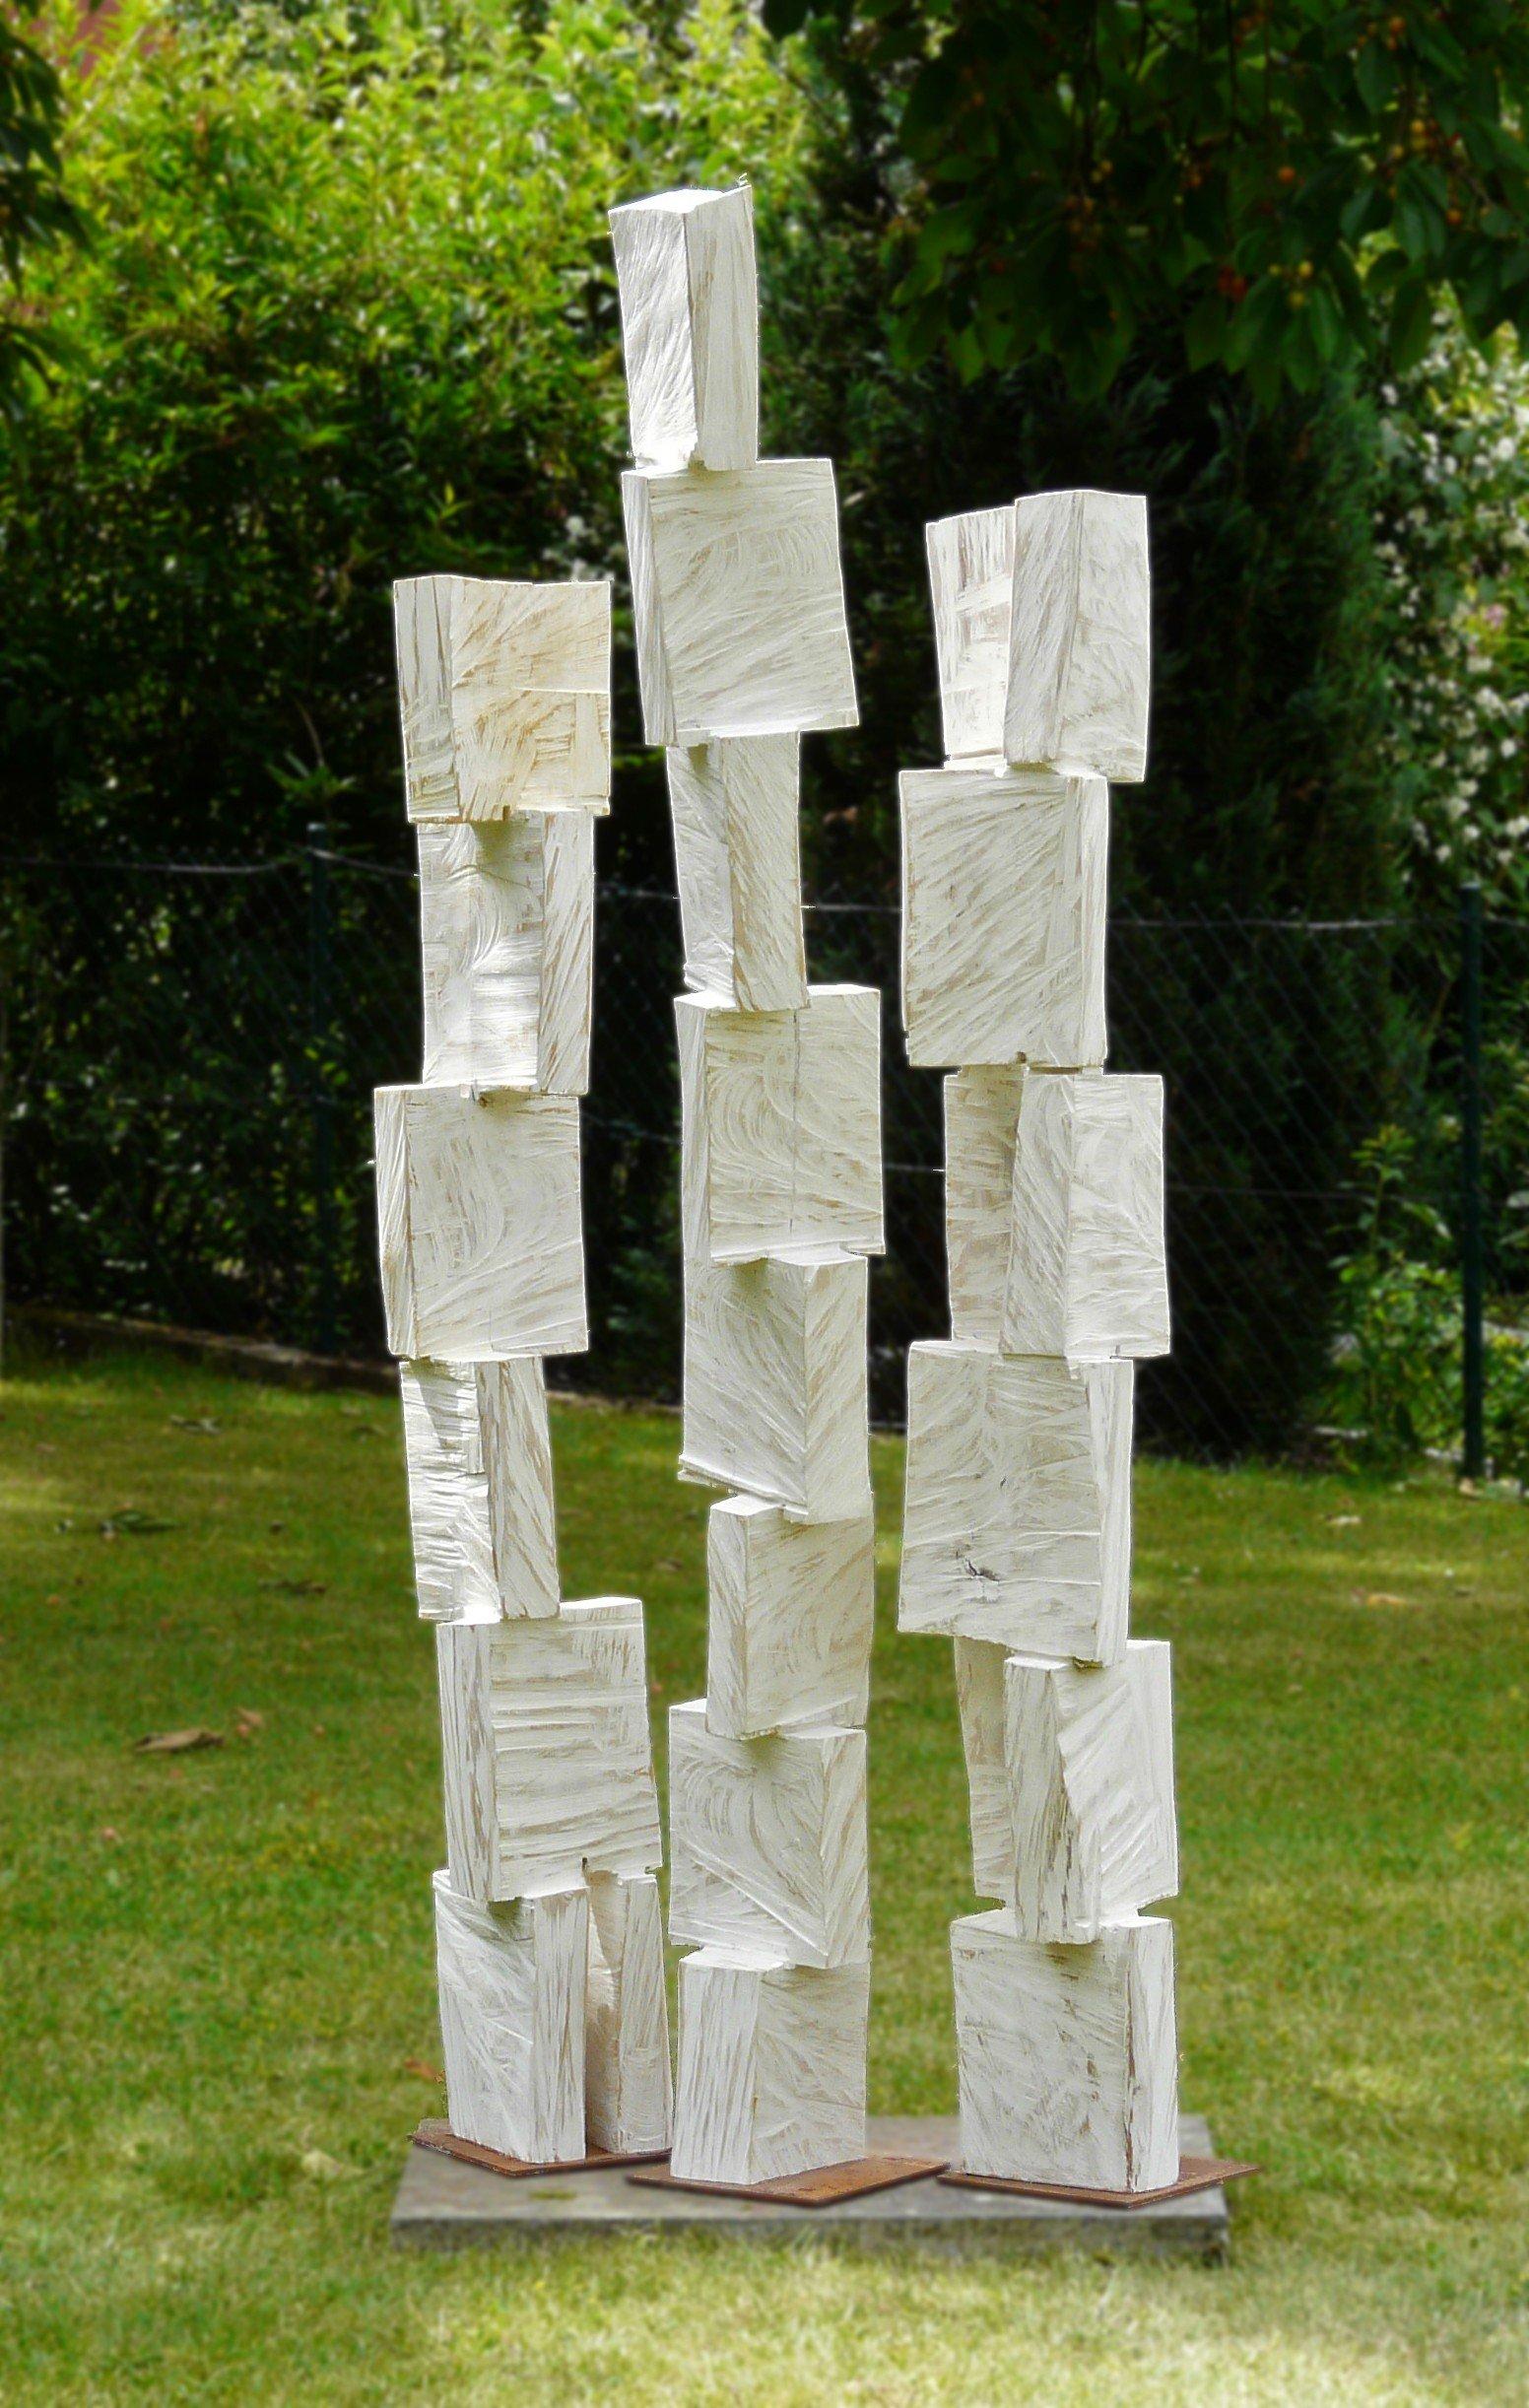 moderne kunst im garten – actof, Terrassen ideen